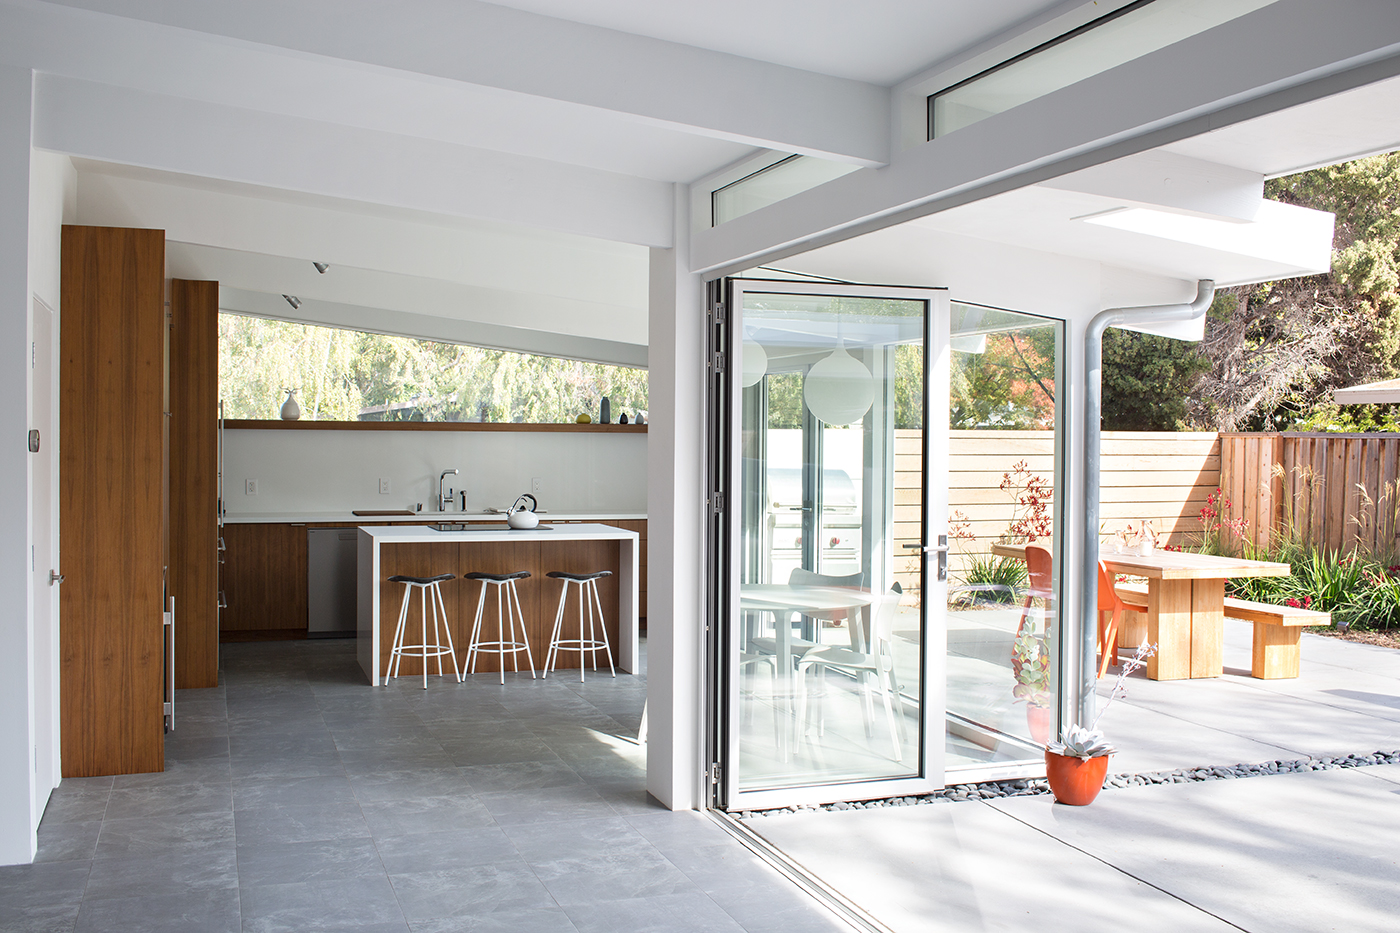 Truly open eichler house architect magazine klopf - Casas americanas por dentro ...